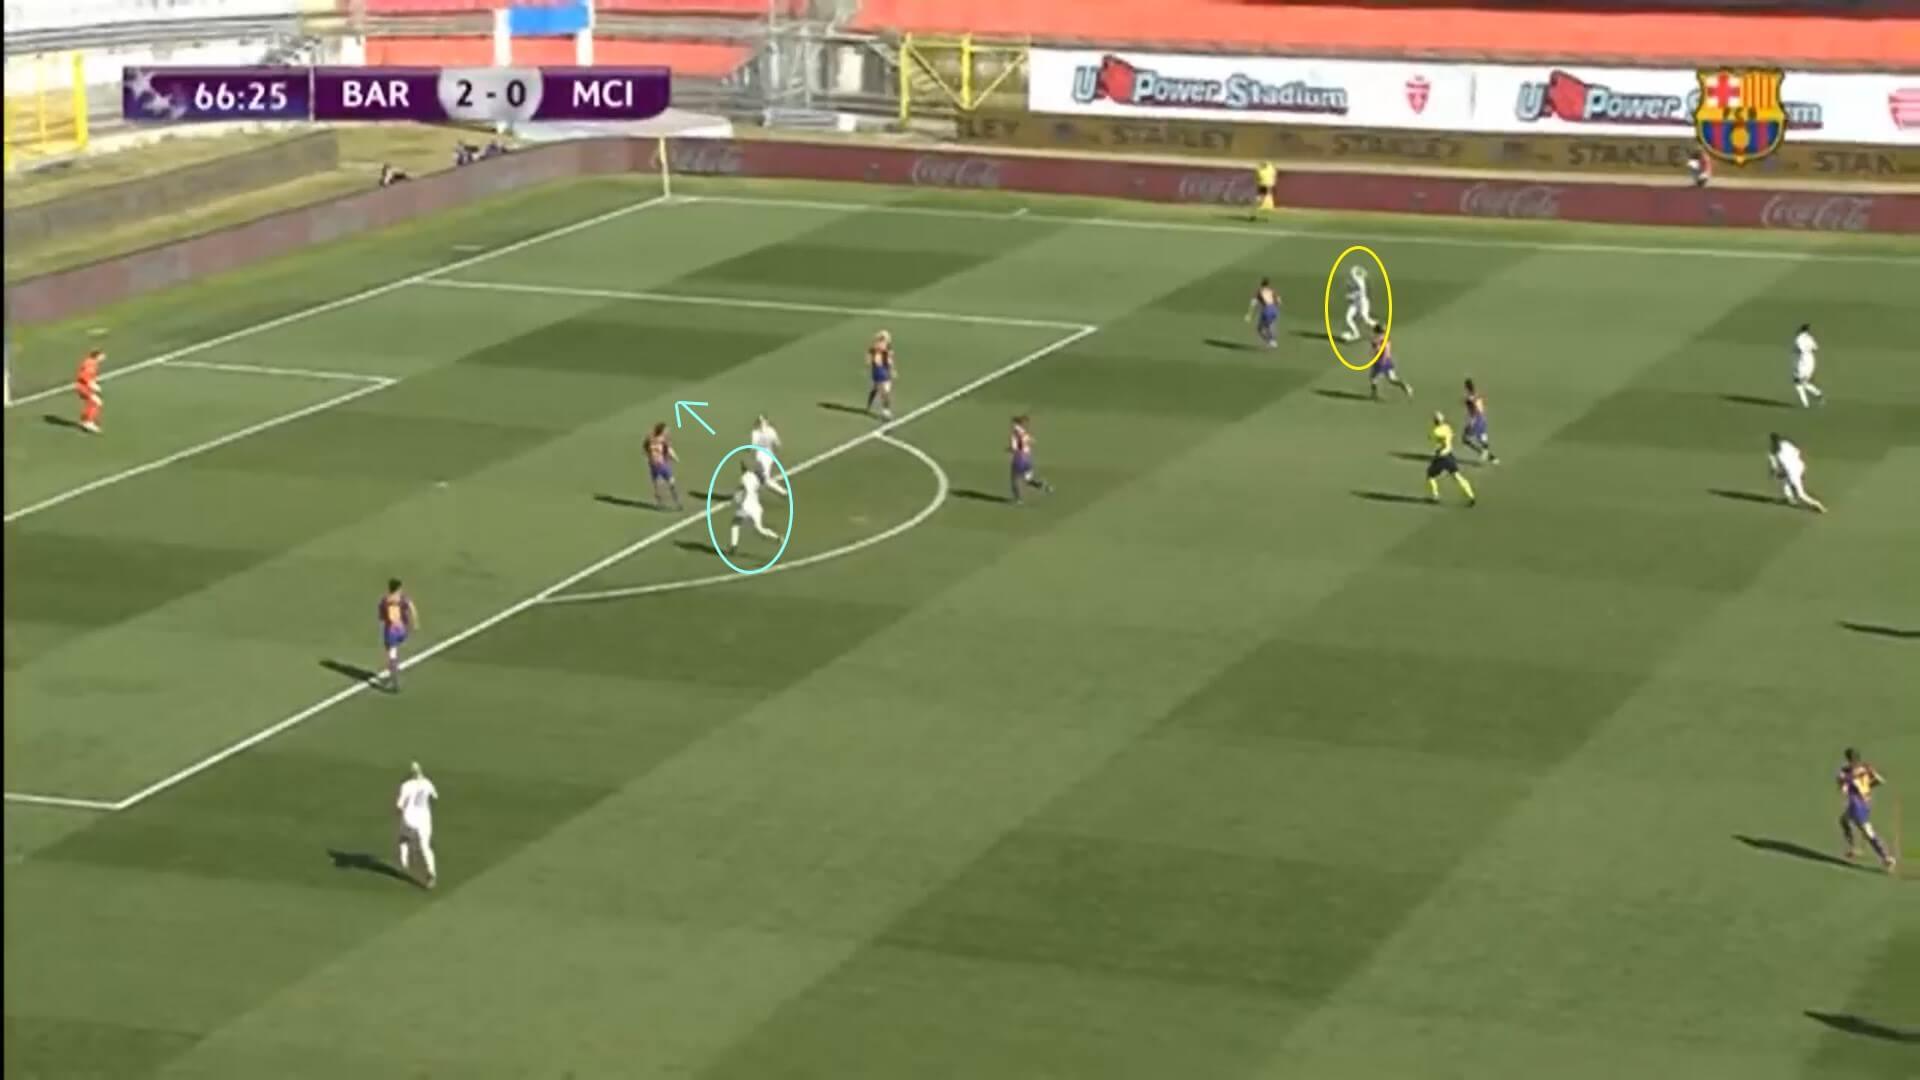 Women's Champions League 2020/2021: Barcelona Femini v Manchester City Women - tactical analysis tactics